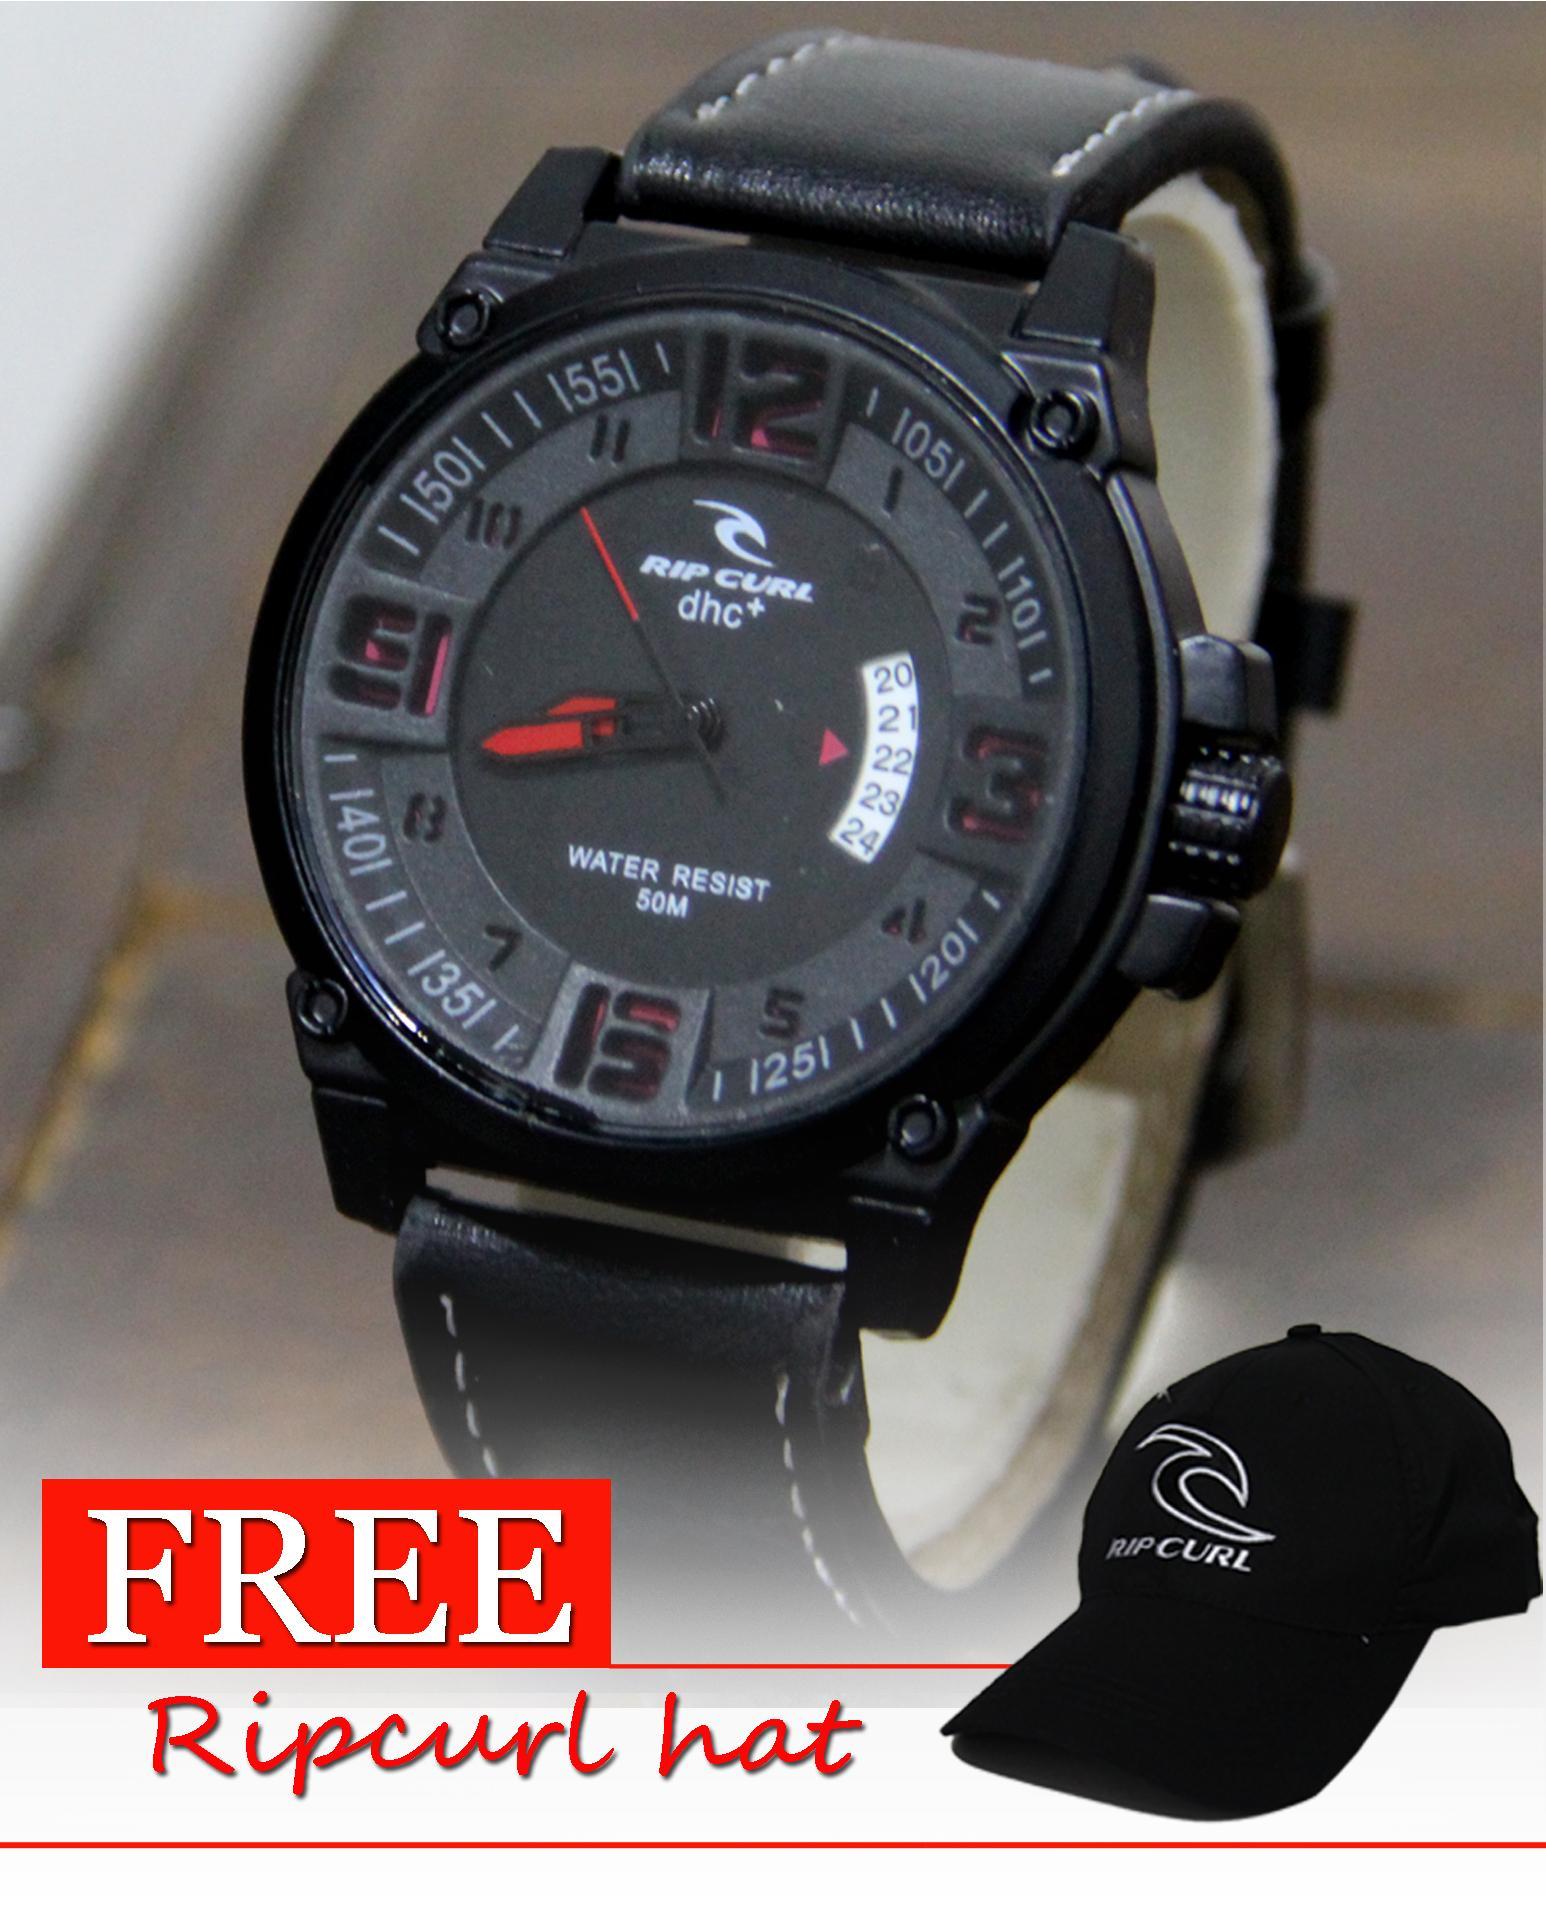 JAM TANGAN PRIA Ripcurl swiss Army Outdoor watch - Jam Tangan Fashion Pria - Tanggal bulan